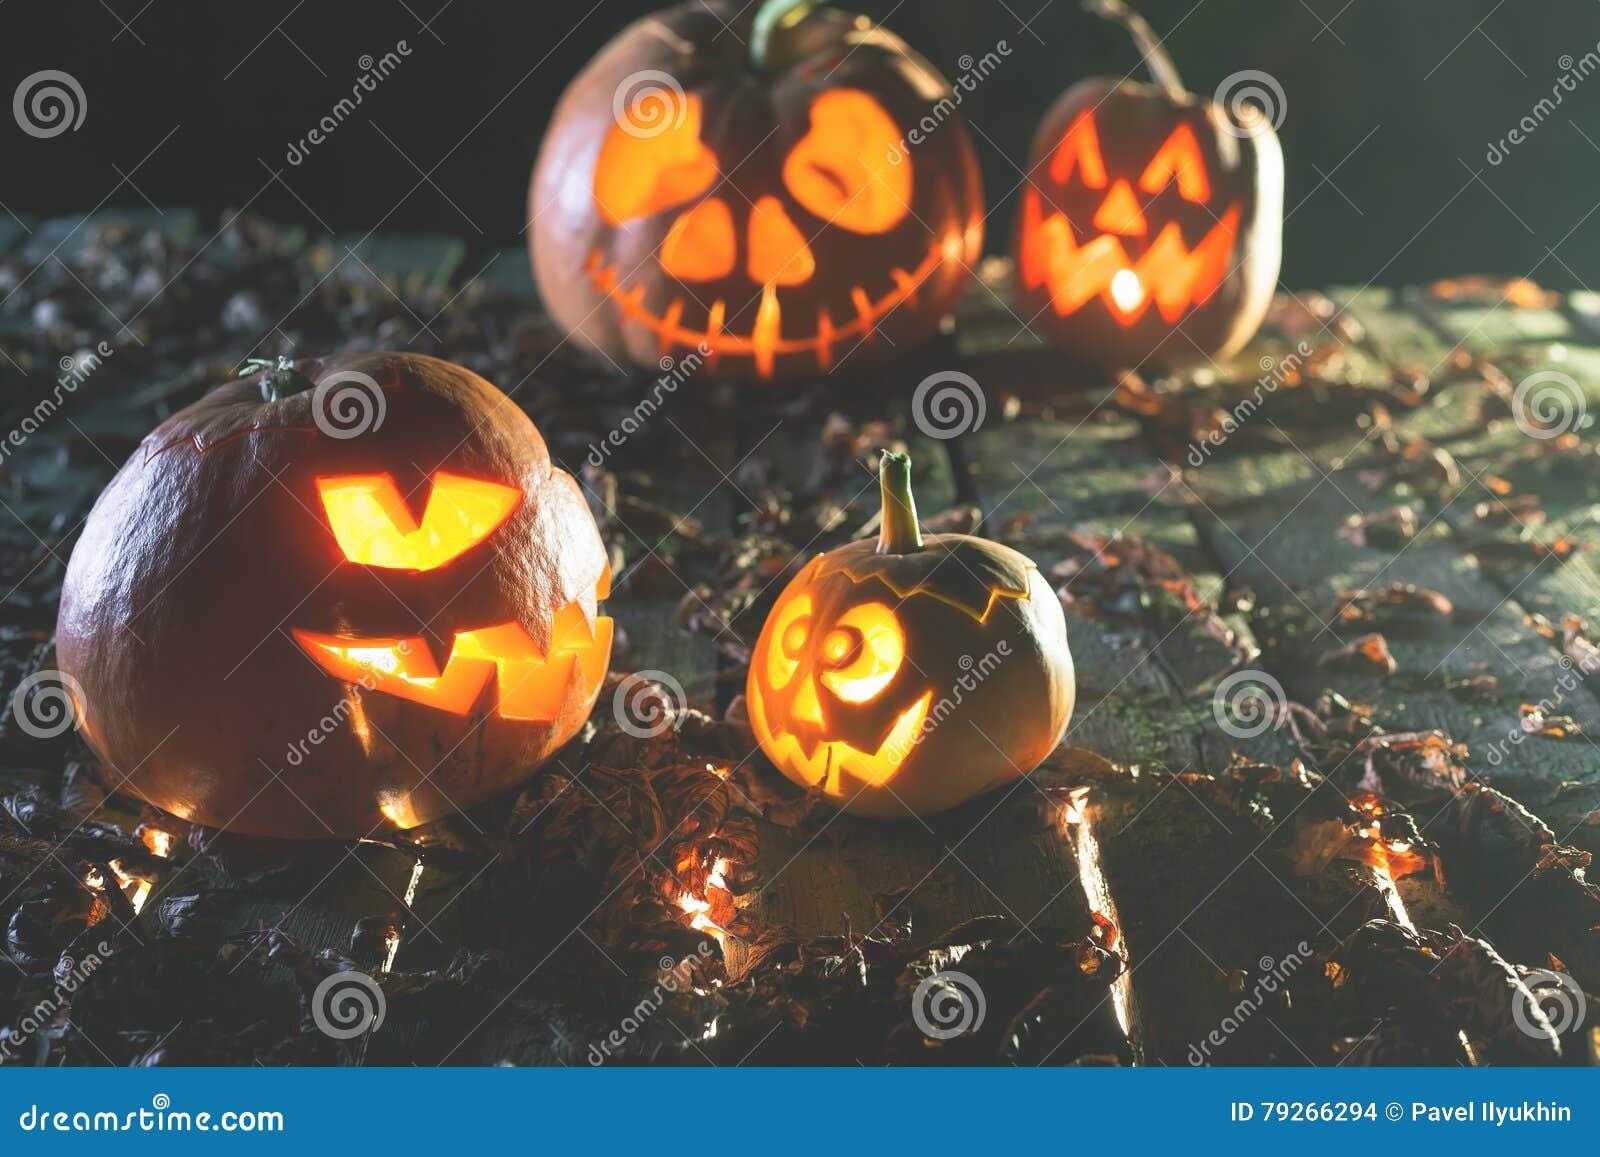 Immagine Zucca Di Halloween 94.Zucche Di Halloween A Fondo Di Legno Fronti Spaventosi Scolpiti